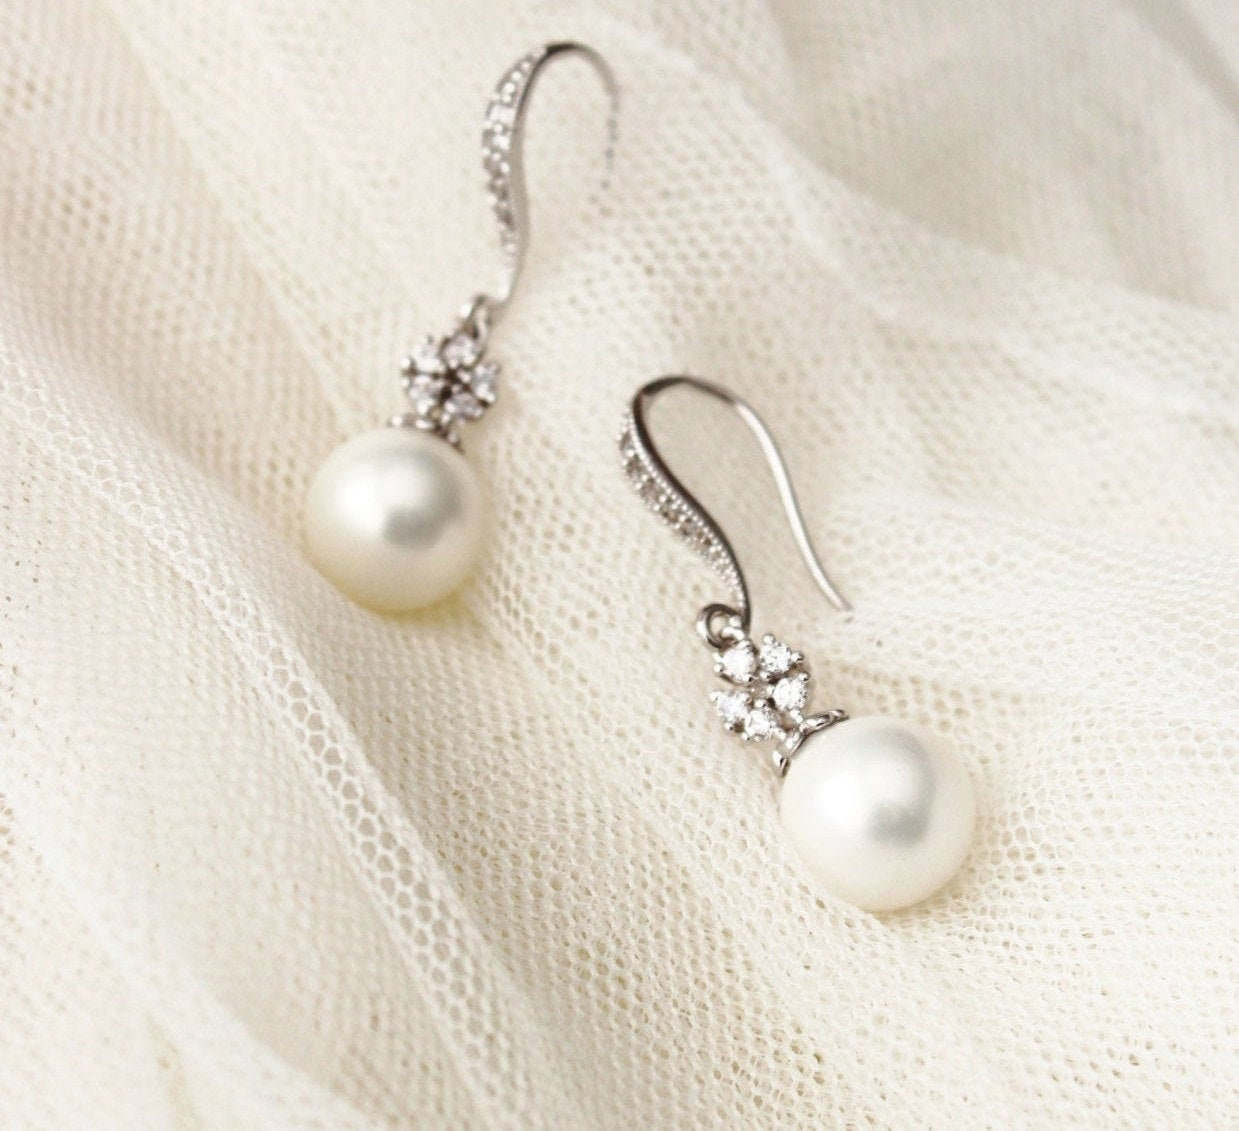 pearl jewelry freshwater pearl earrings drop earrings mother/'s day jewelry bridal earrings gifts for her Pearl Earrings